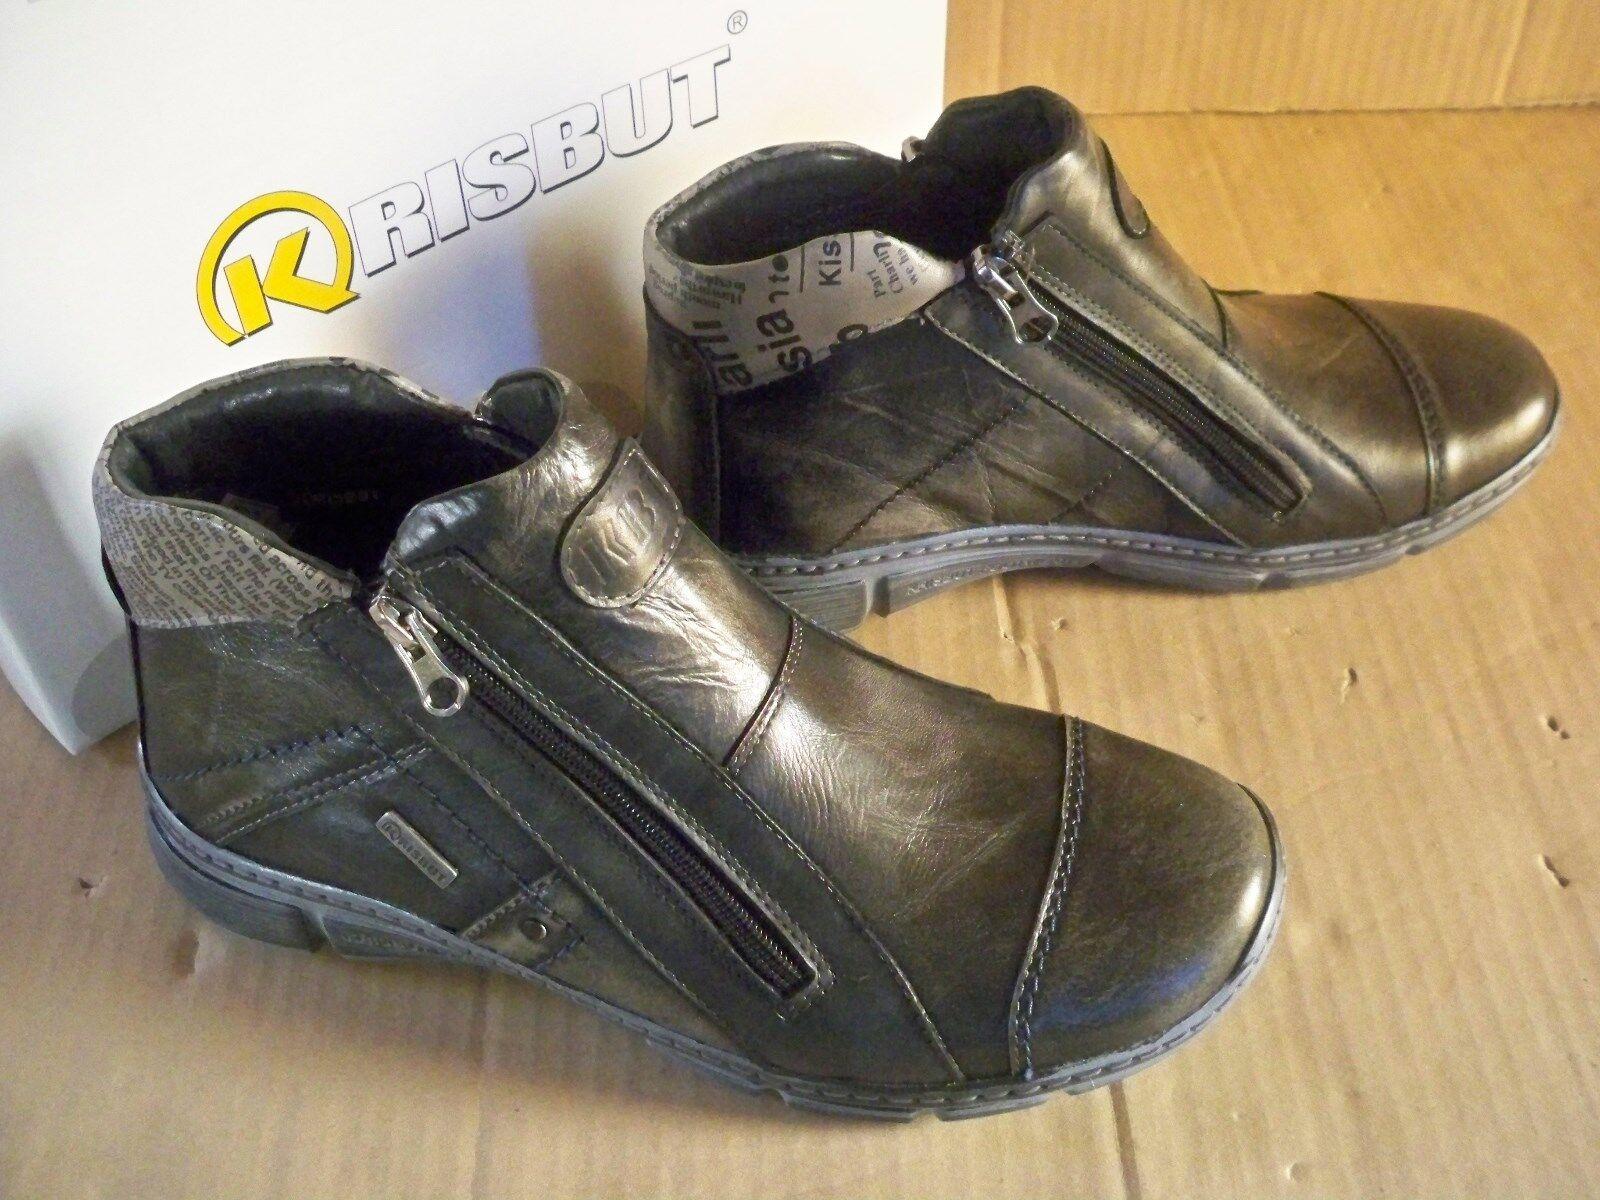 Krisbut  Herren Schuhe Stiefel Leder Boots 6419-1-4 gefüttert  Gr 45 antrazit